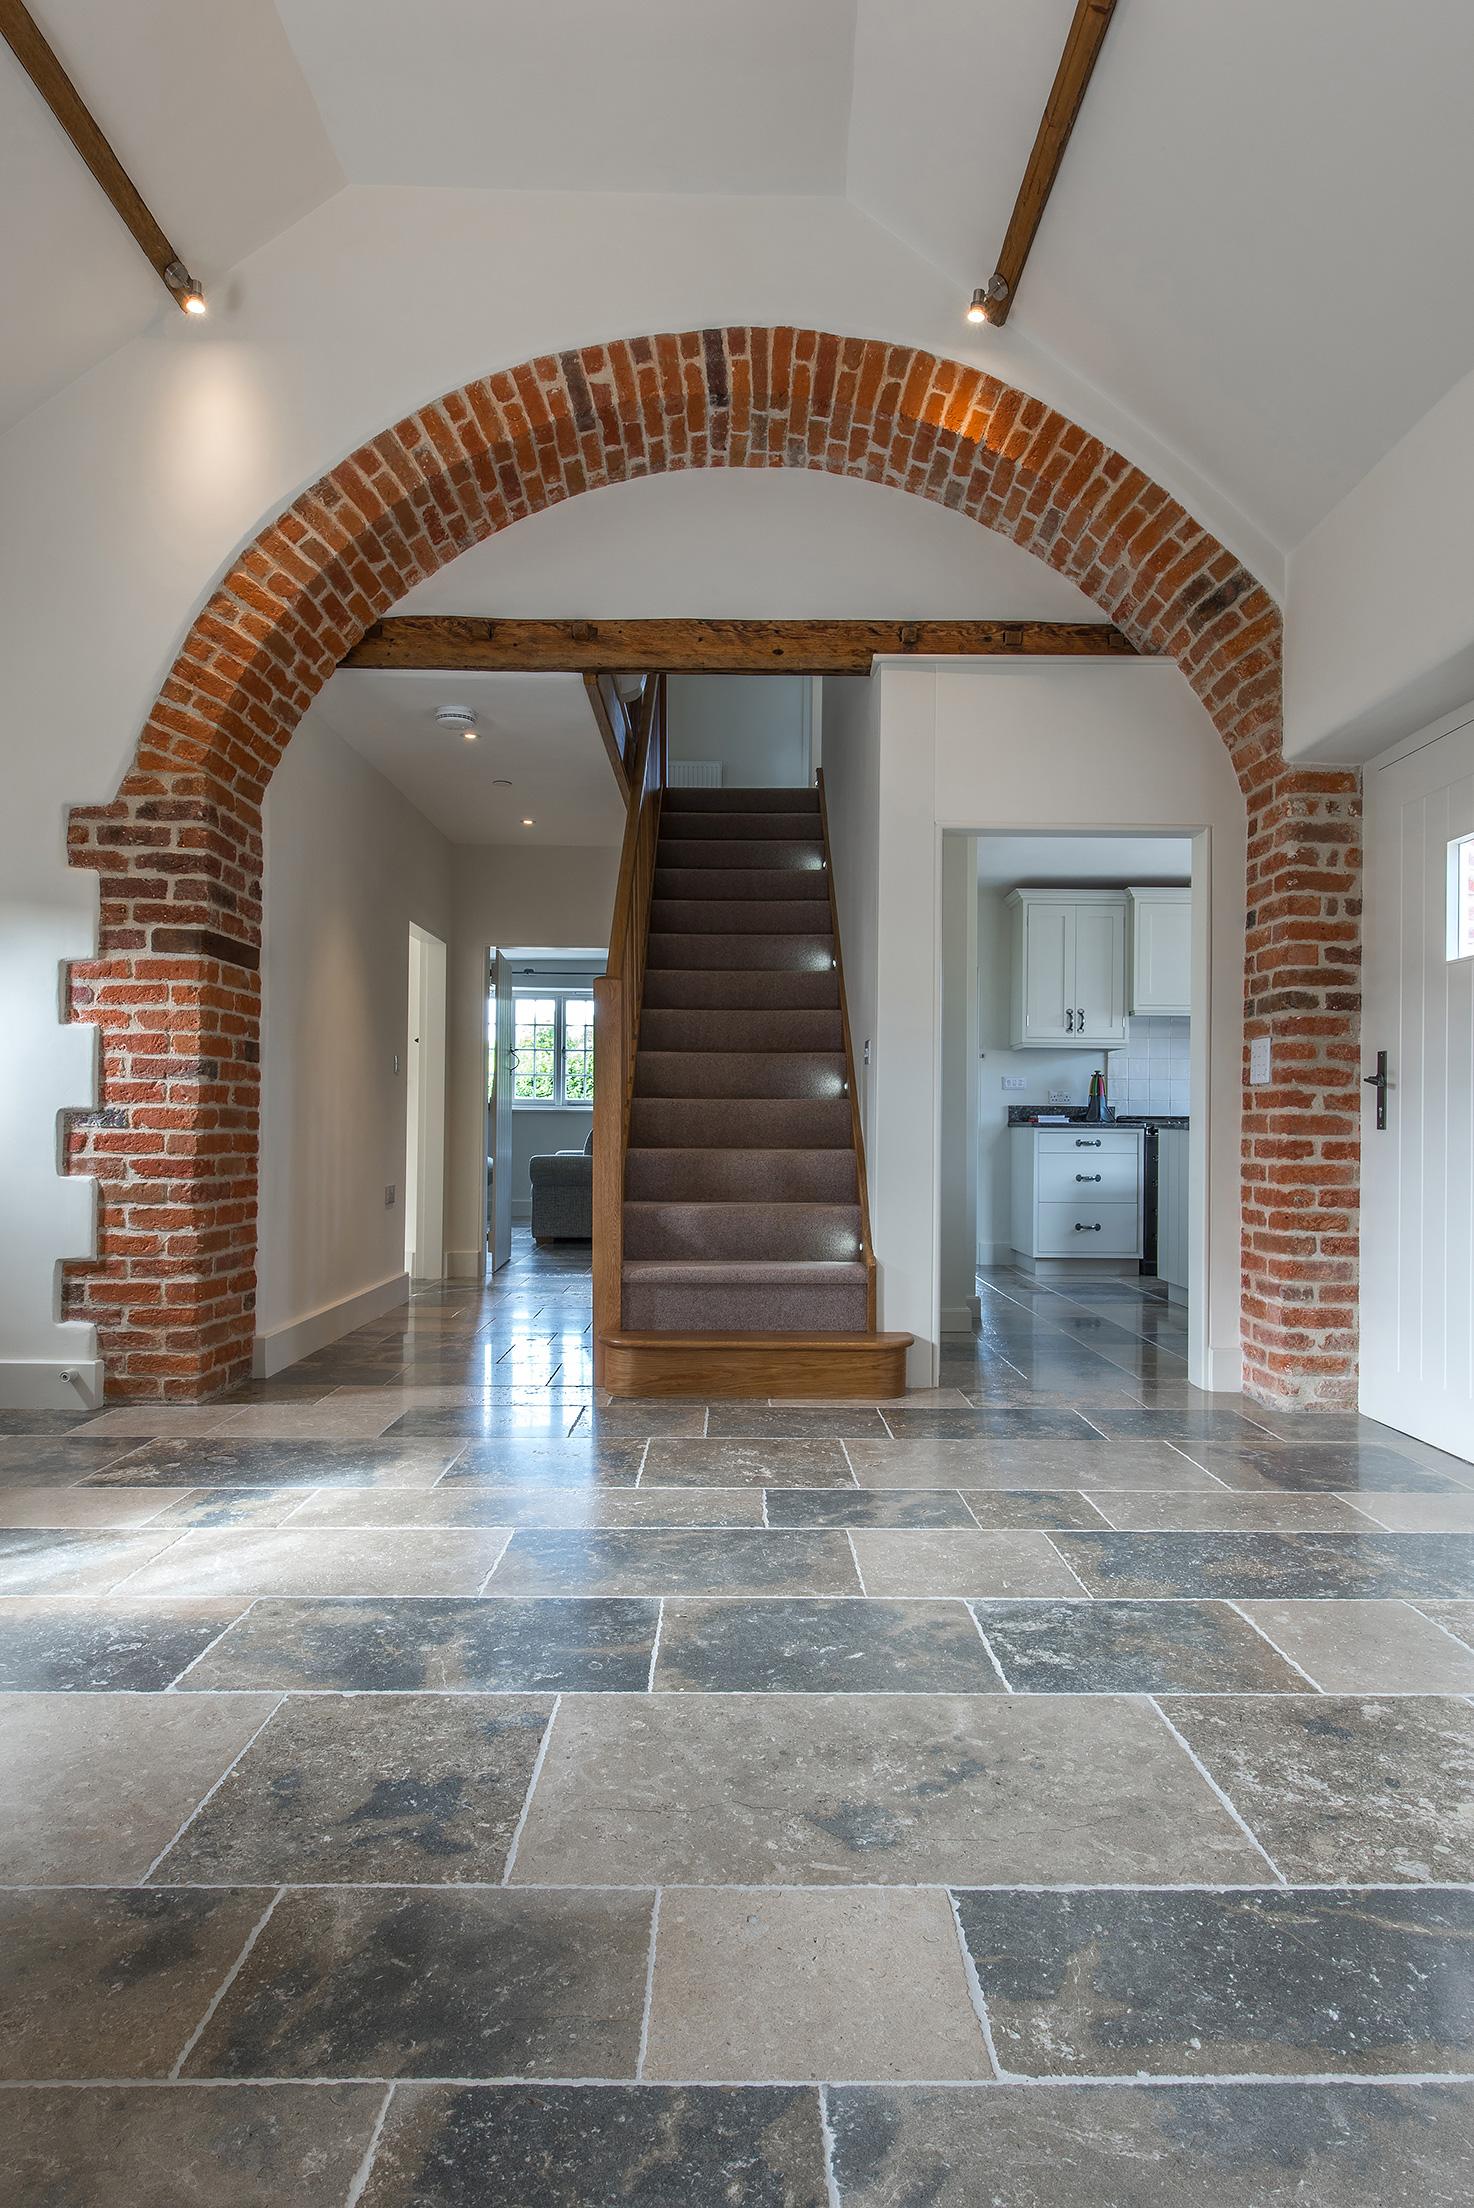 Manor-Farm-Interior-Residential-Interior-Photography-Devon-4.jpg